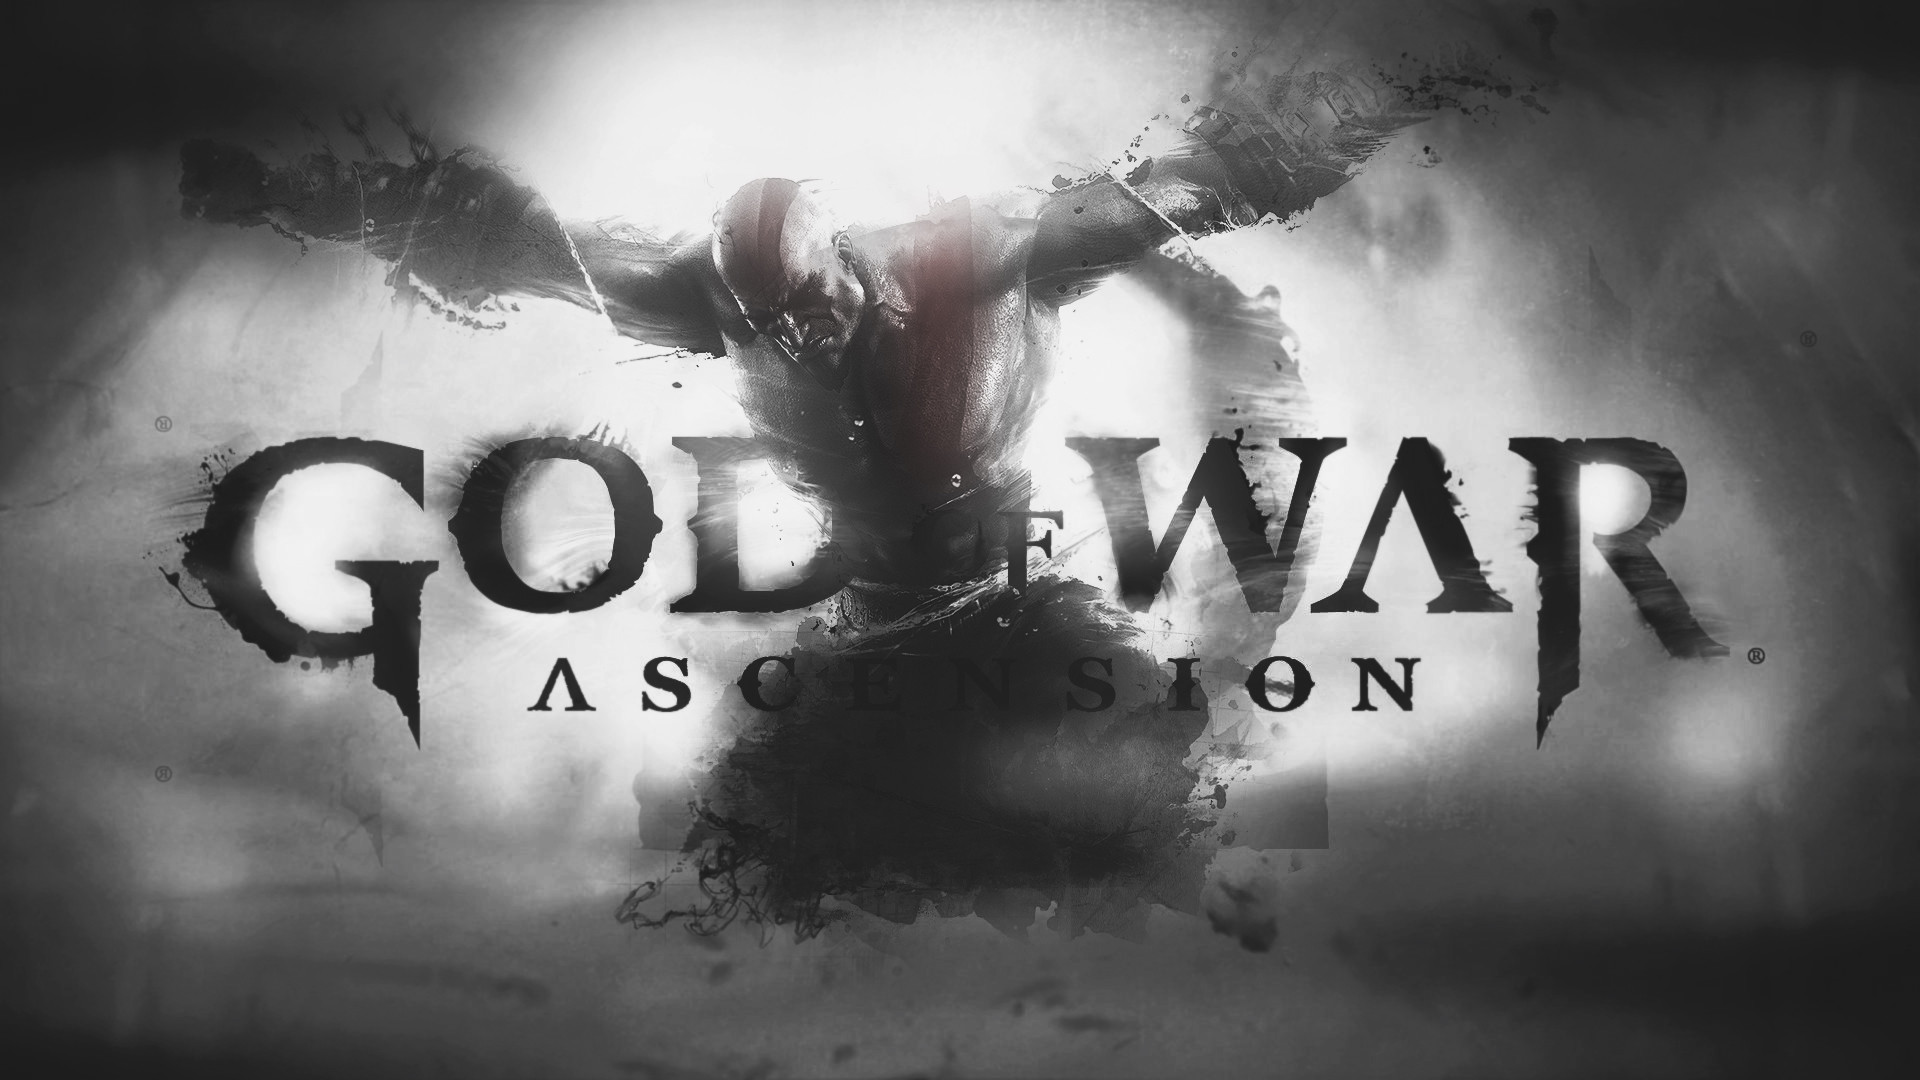 God of war ascension full hd wallpaper and background image video game god of war ascension wallpaper voltagebd Gallery